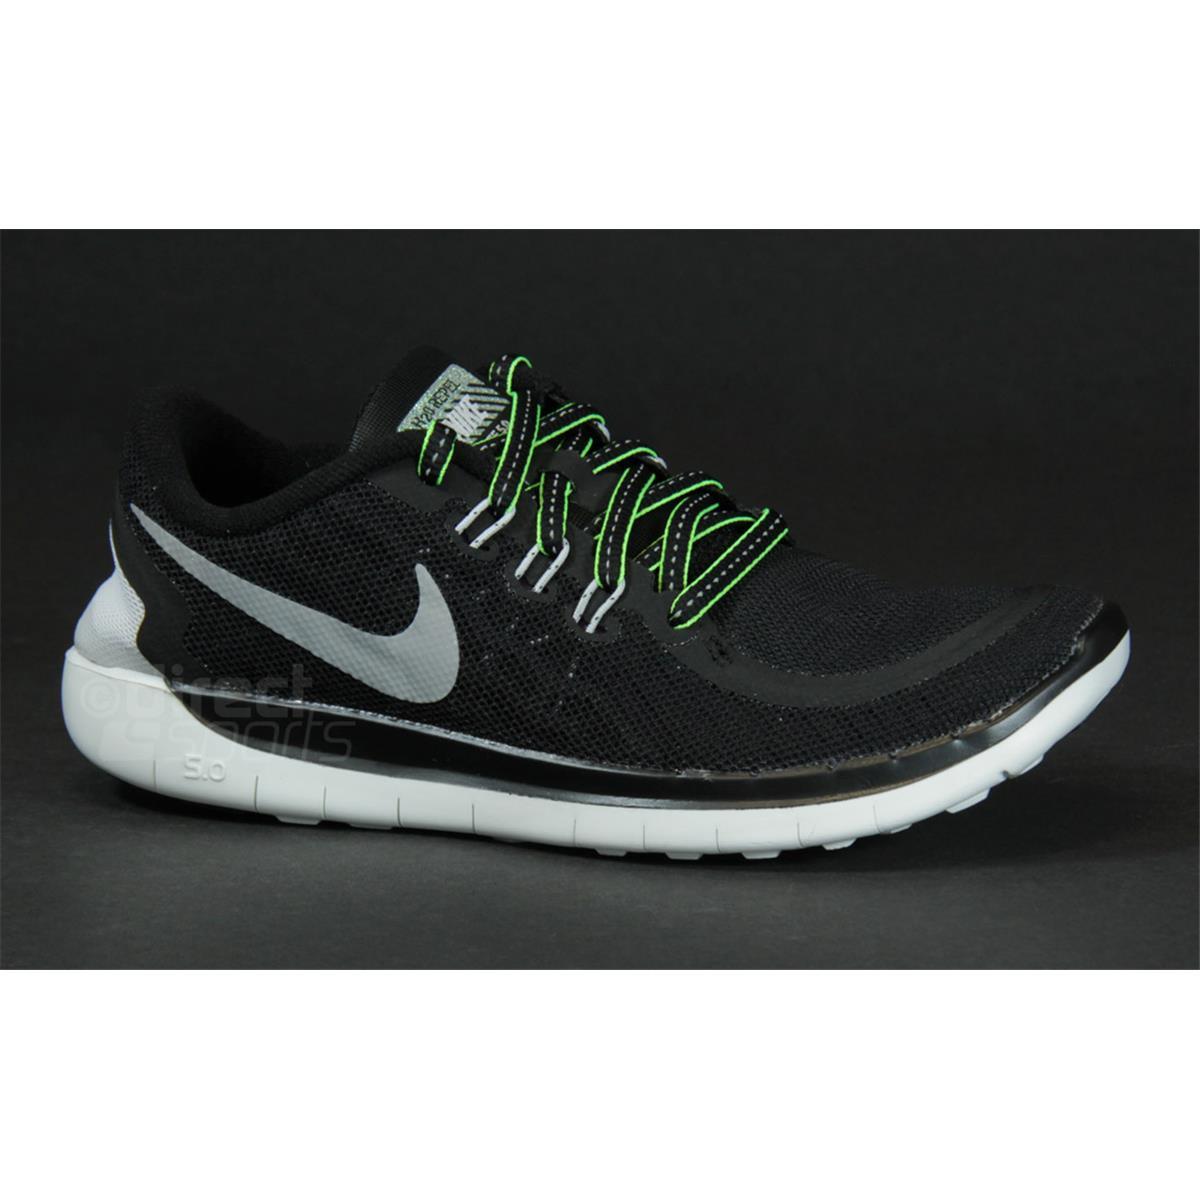 fe770a6c9b53 ... reduced nike free 5.0 flash junior running shoes 17fe7 28317